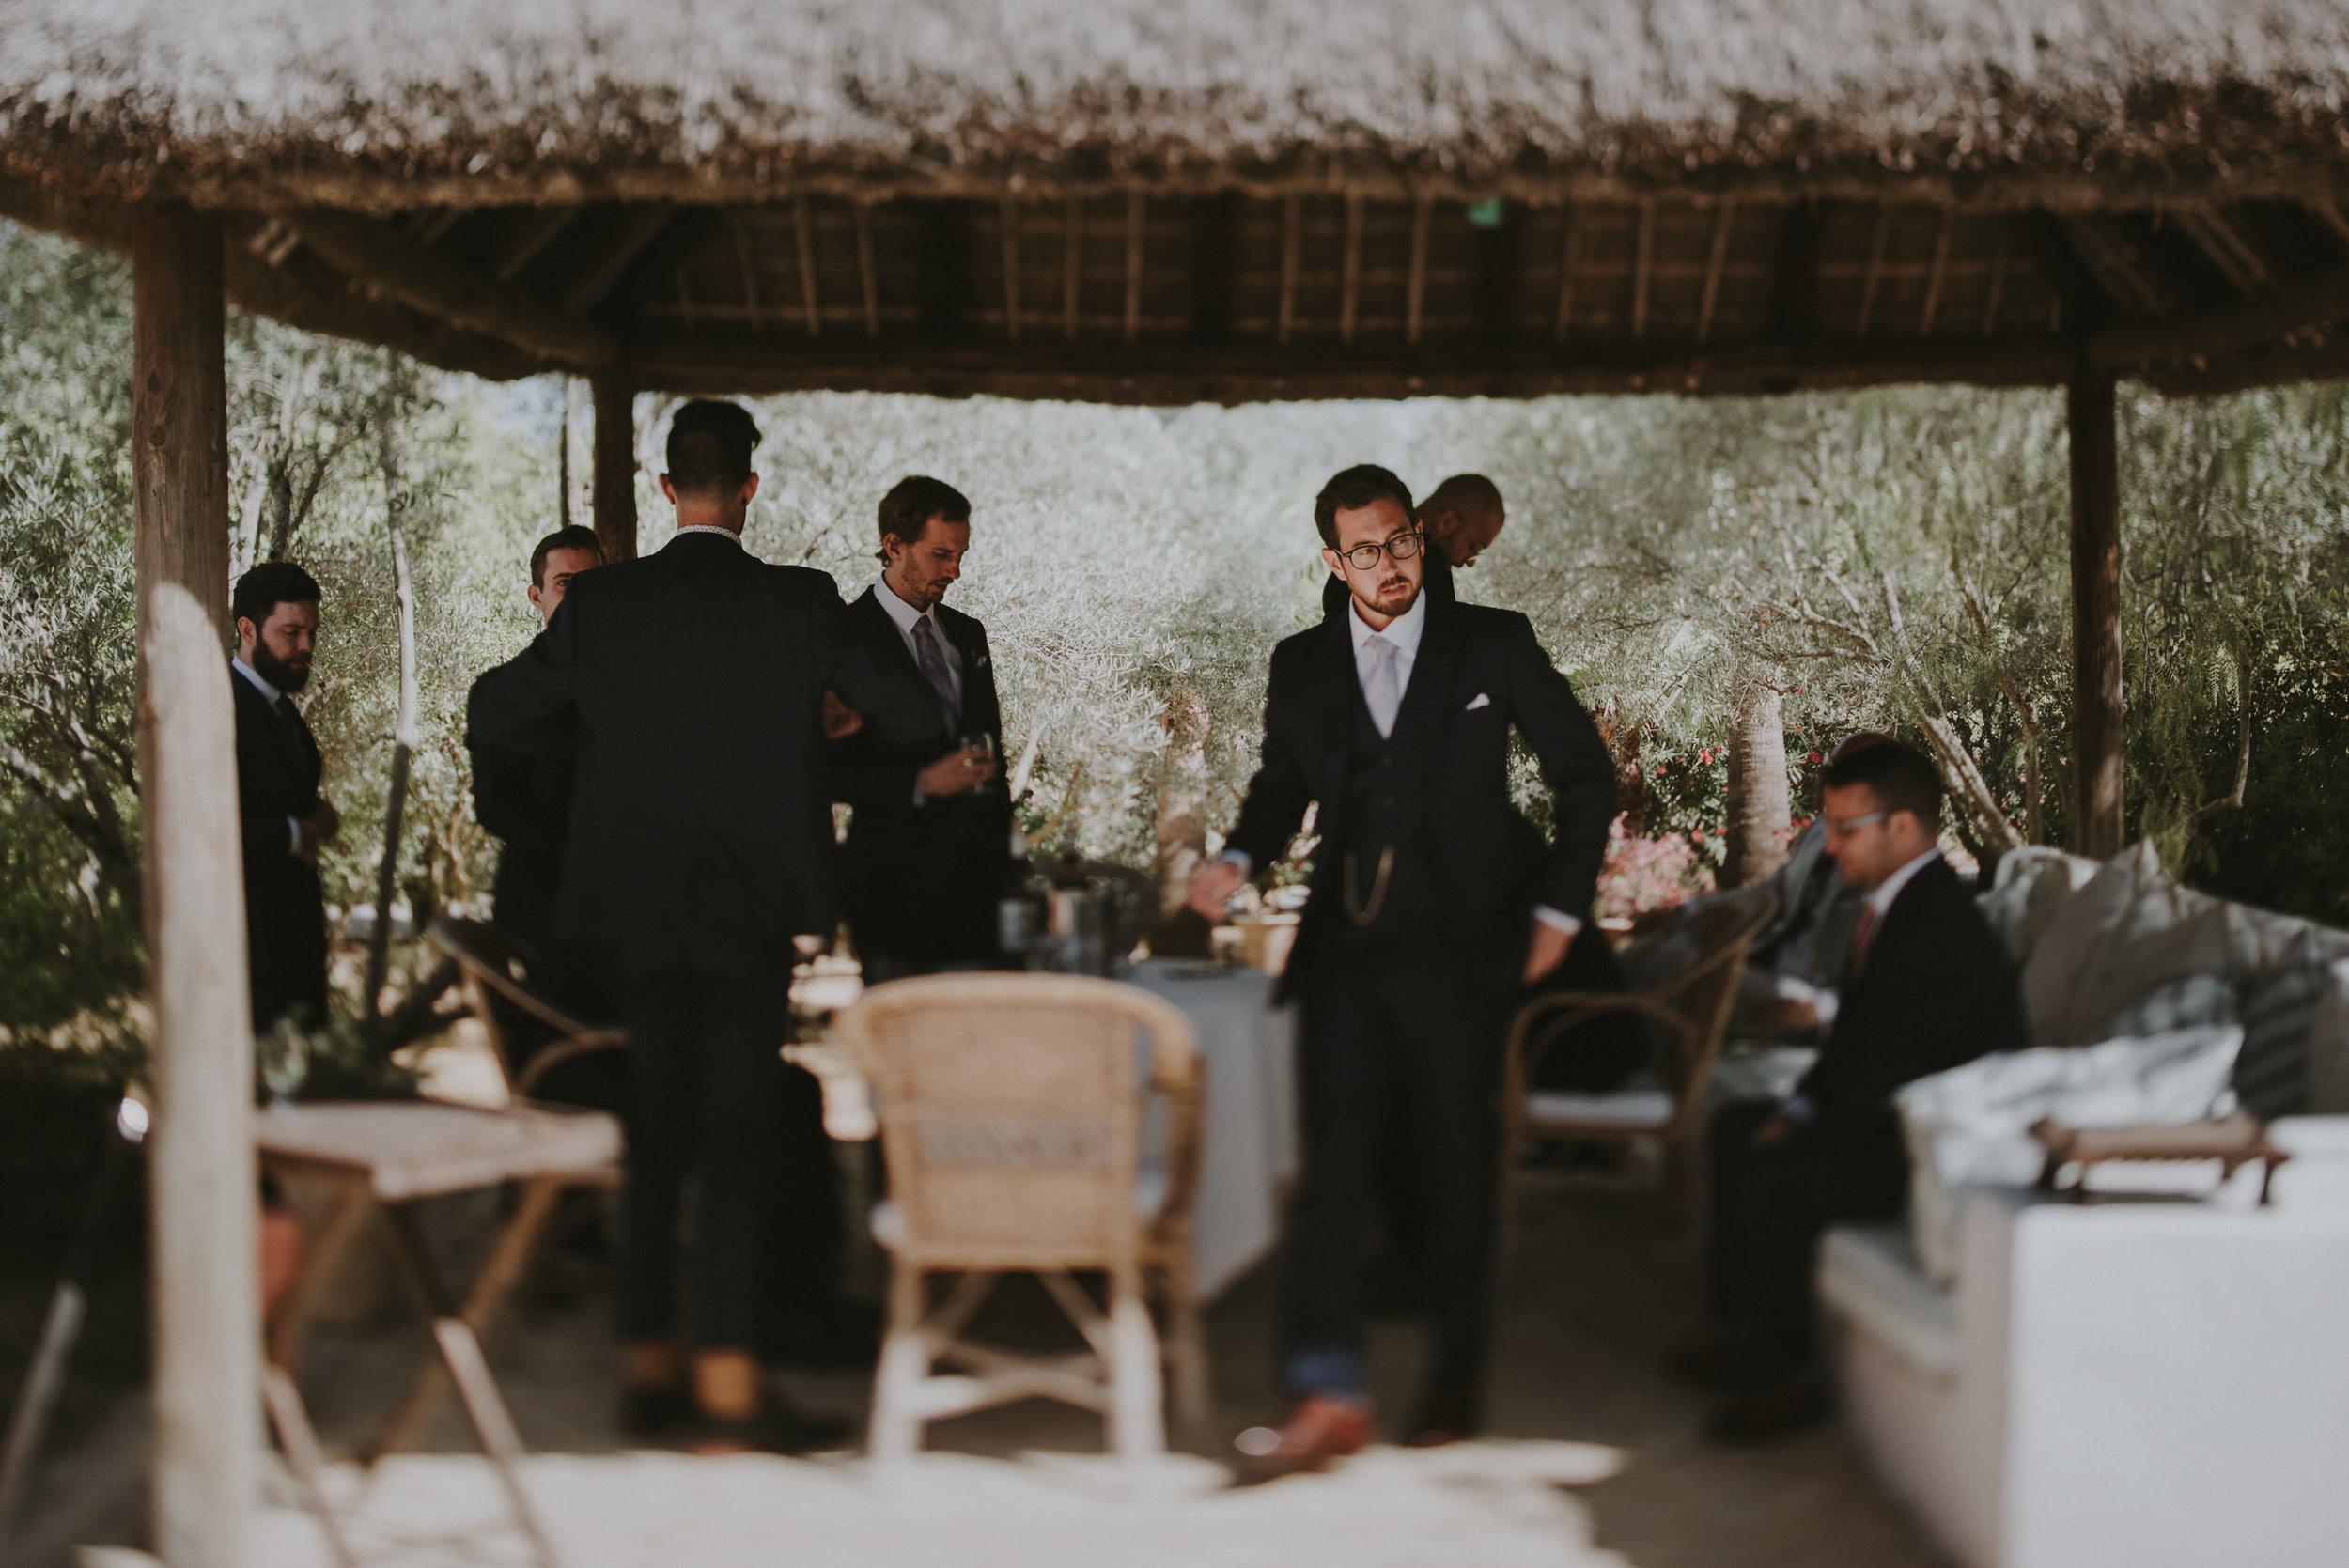 Andres+Amarillo+fotografo+boda+sevilla+natural+sin+poses+hacienda+san+rafael (26).JPG